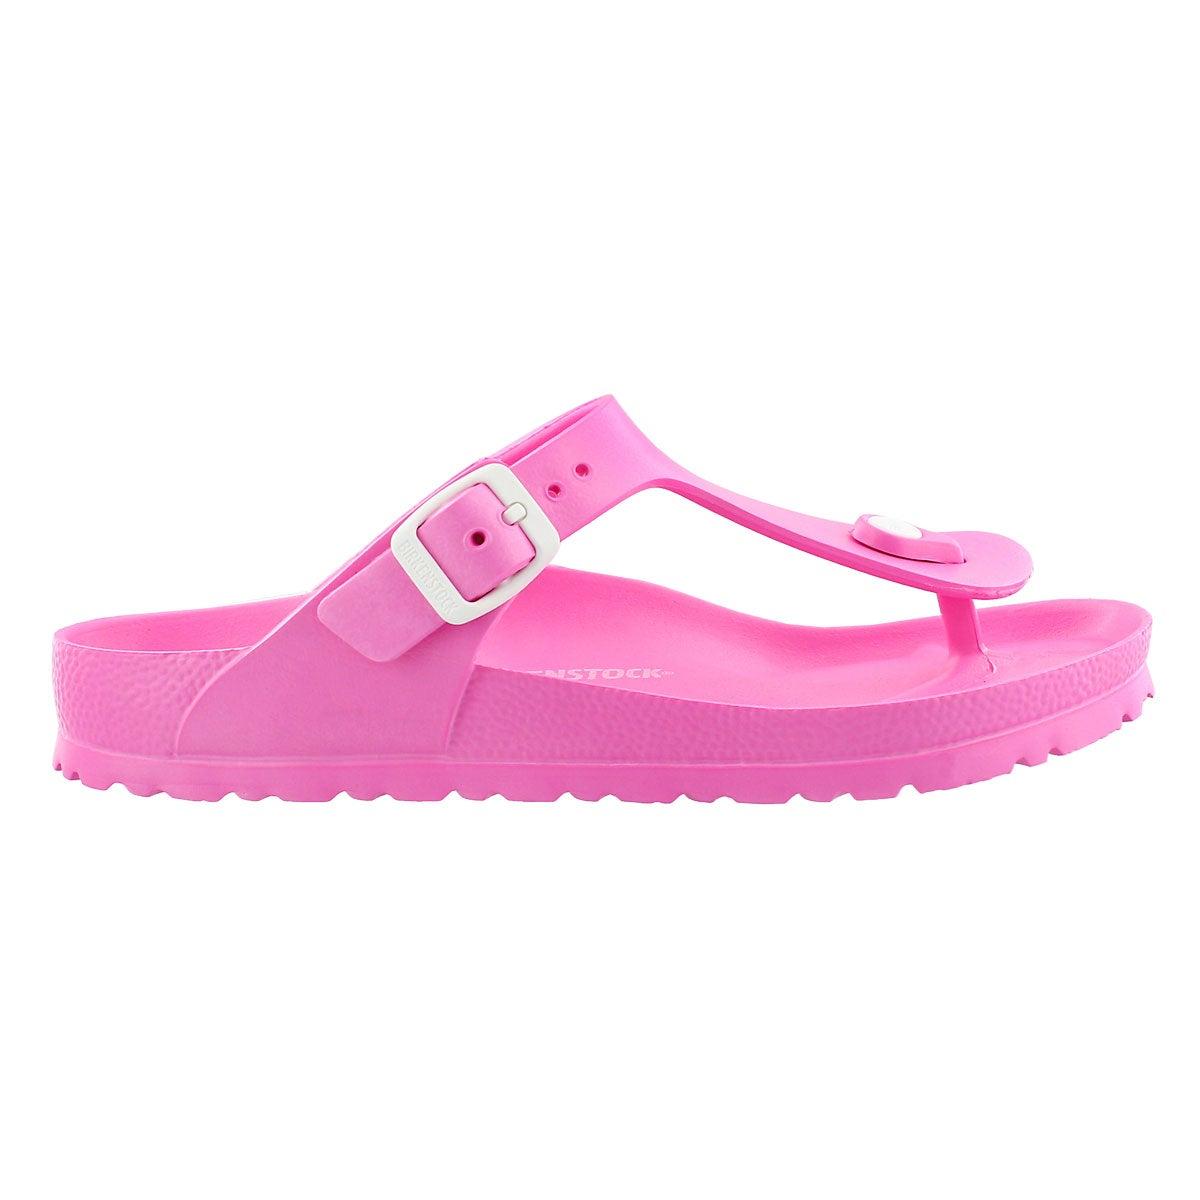 Lds Gizeh EVA neon pink thong sandal